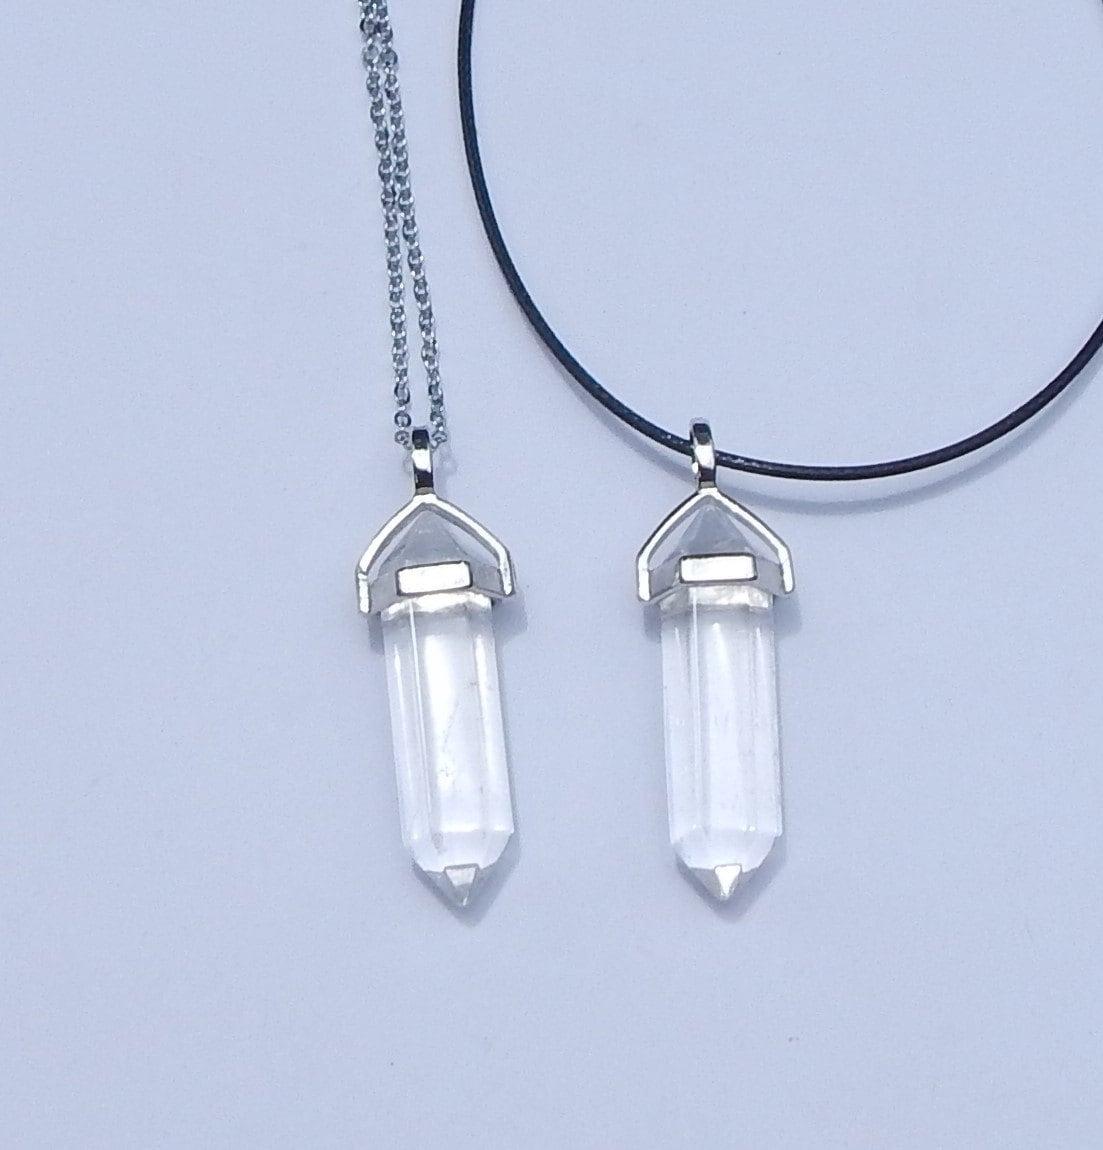 quartz crystal point necklace quartz crystal necklace clear. Black Bedroom Furniture Sets. Home Design Ideas